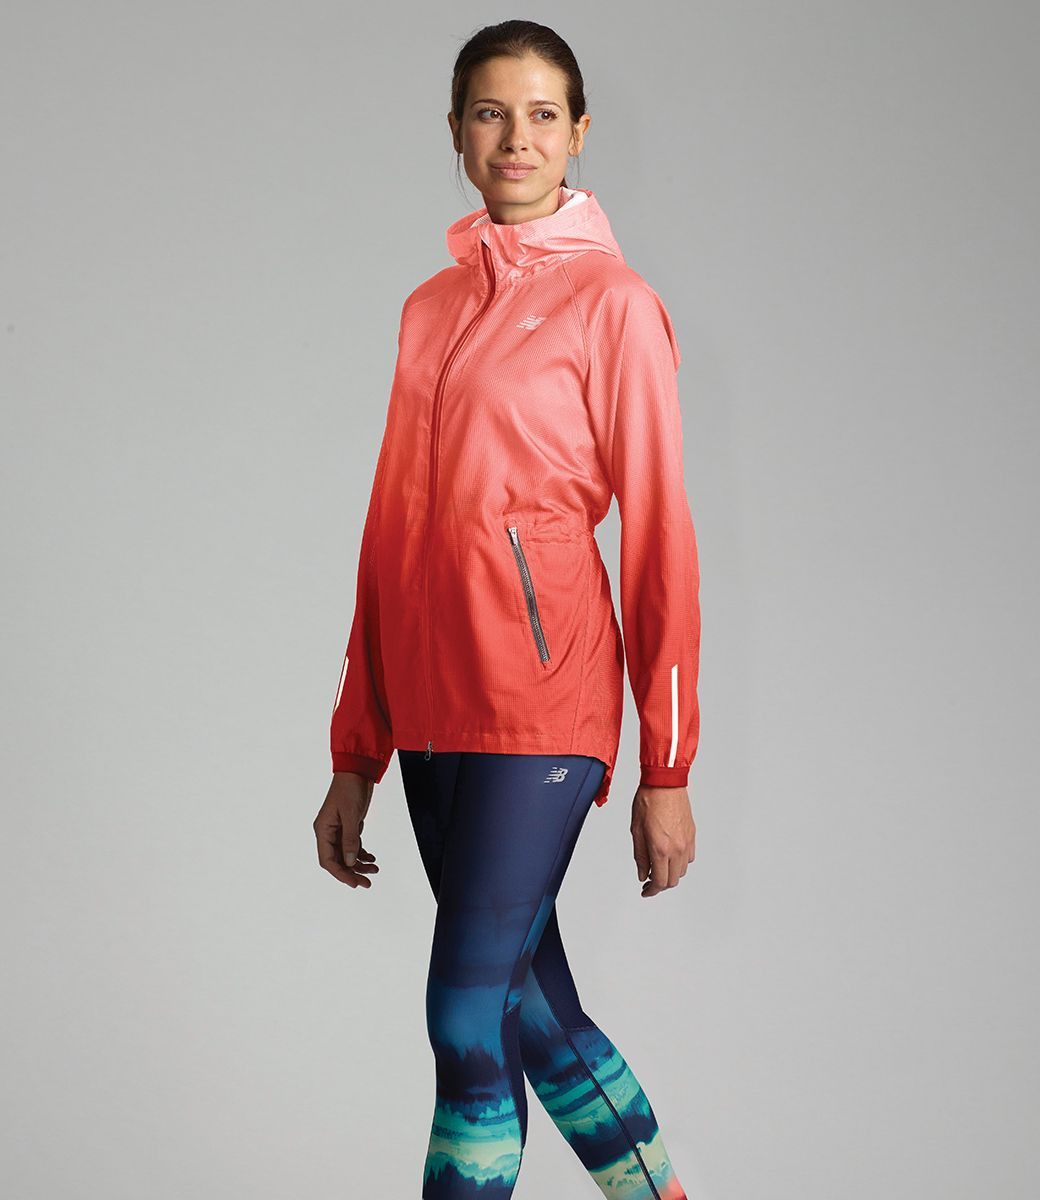 New Balance Women's Key Look 3 Q217,